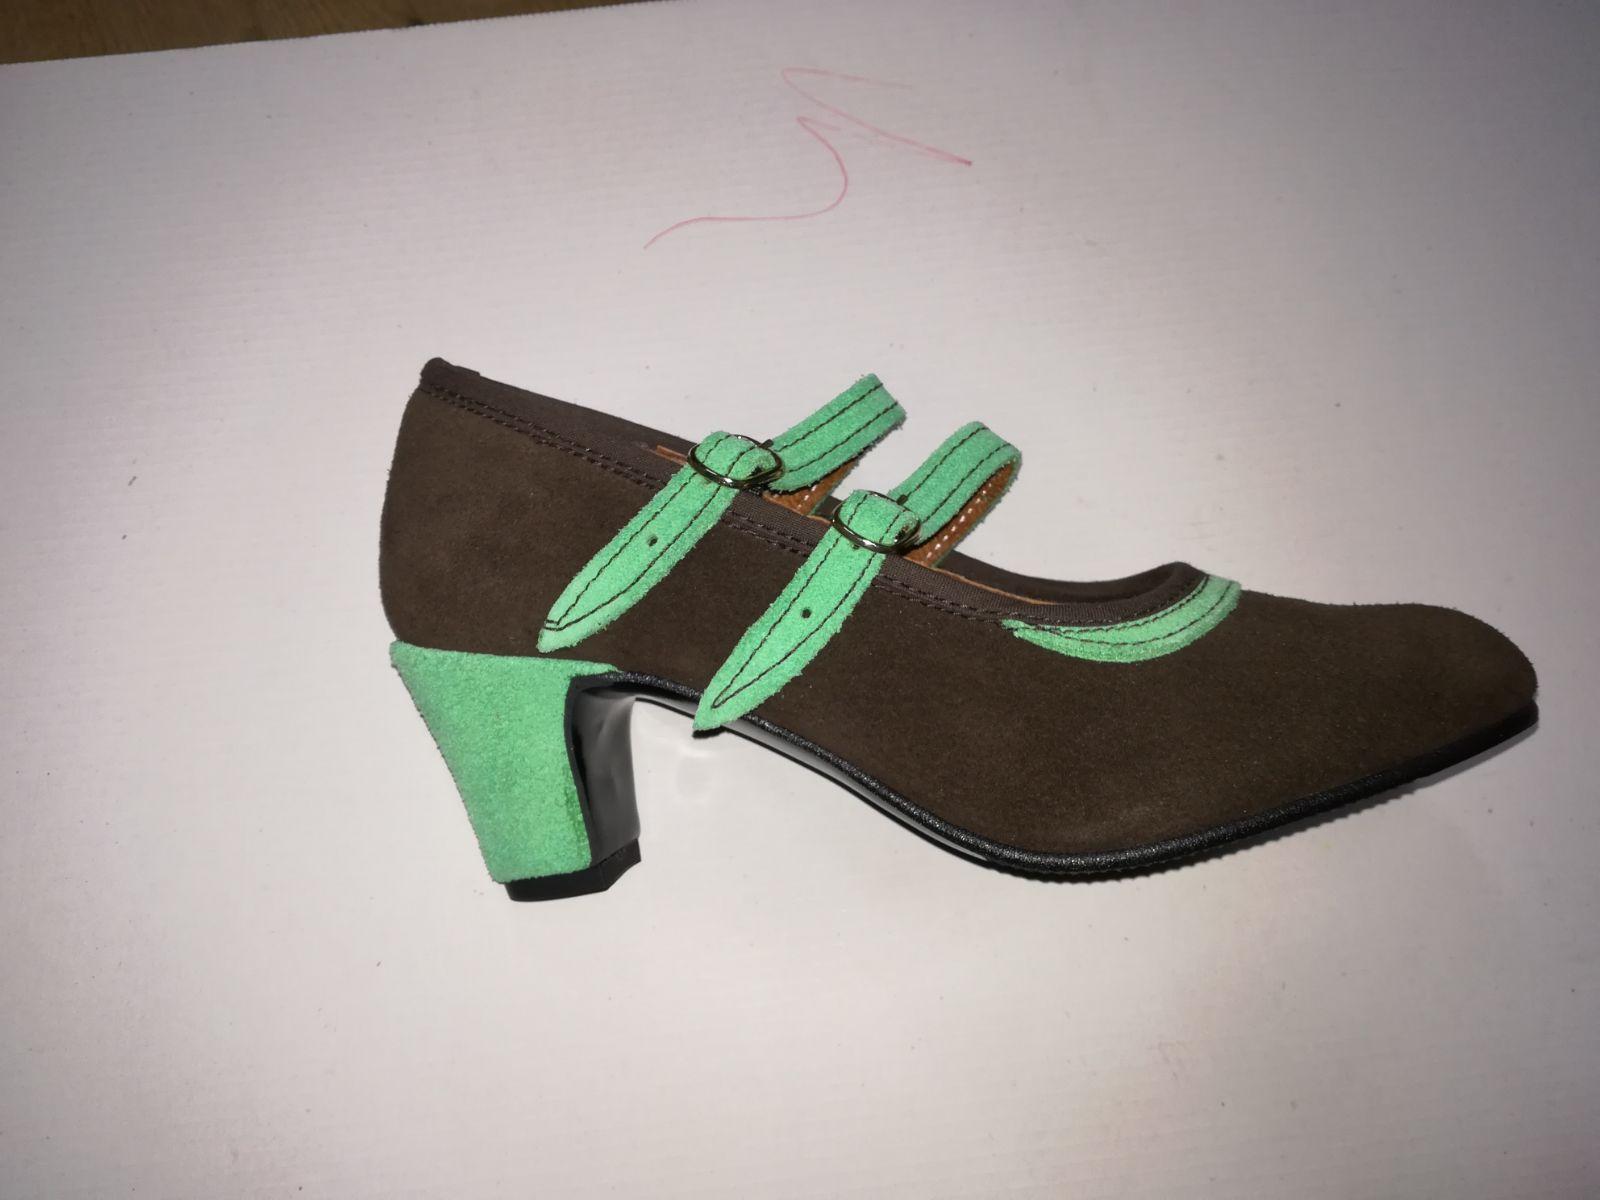 Zapato de ante: Productos de Calzados Malaca